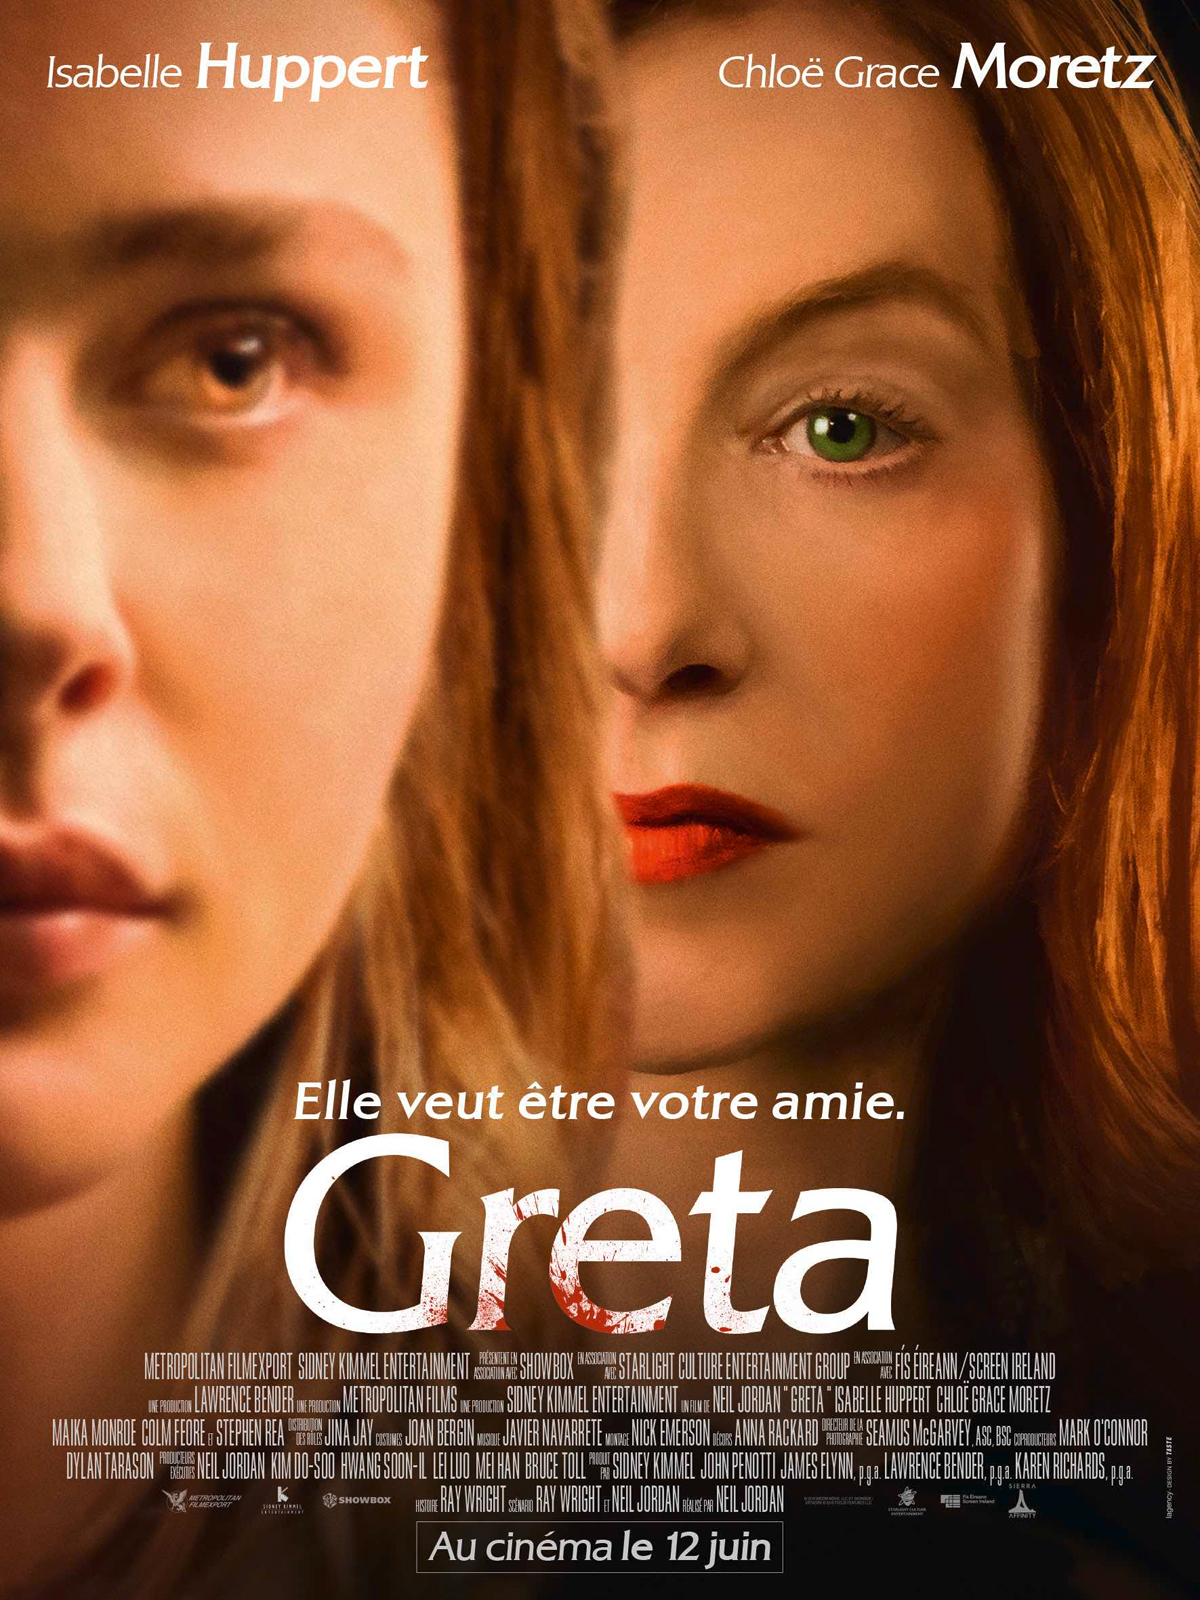 Cinemart Greta De Neil Jordan 2018